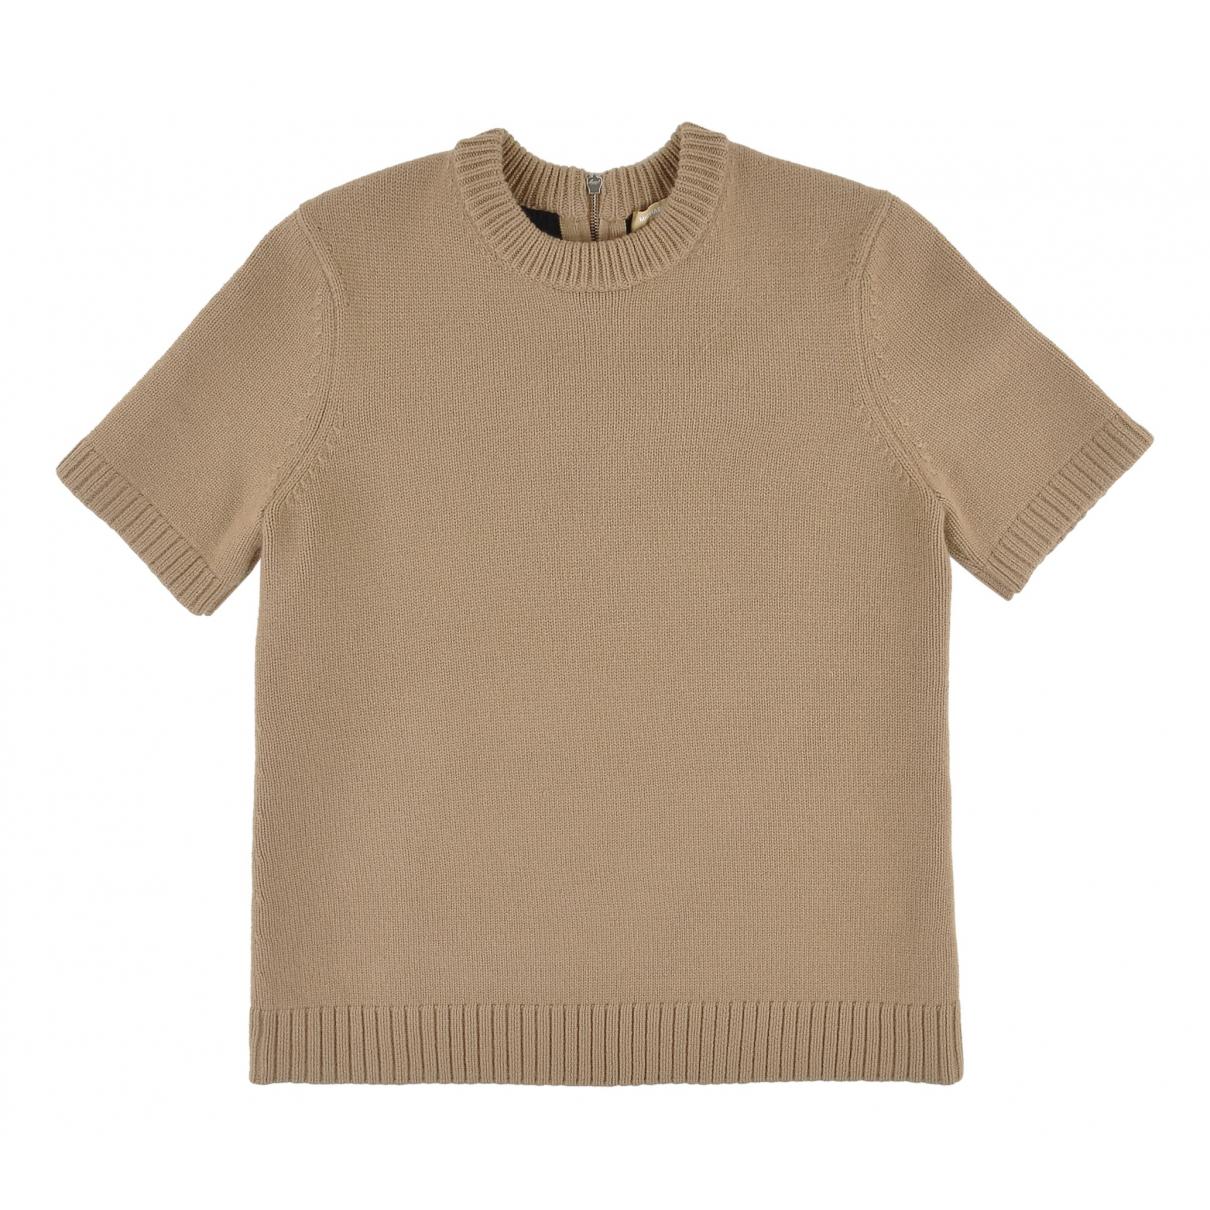 Michael Kors \N Brown Cashmere Knitwear for Women M International